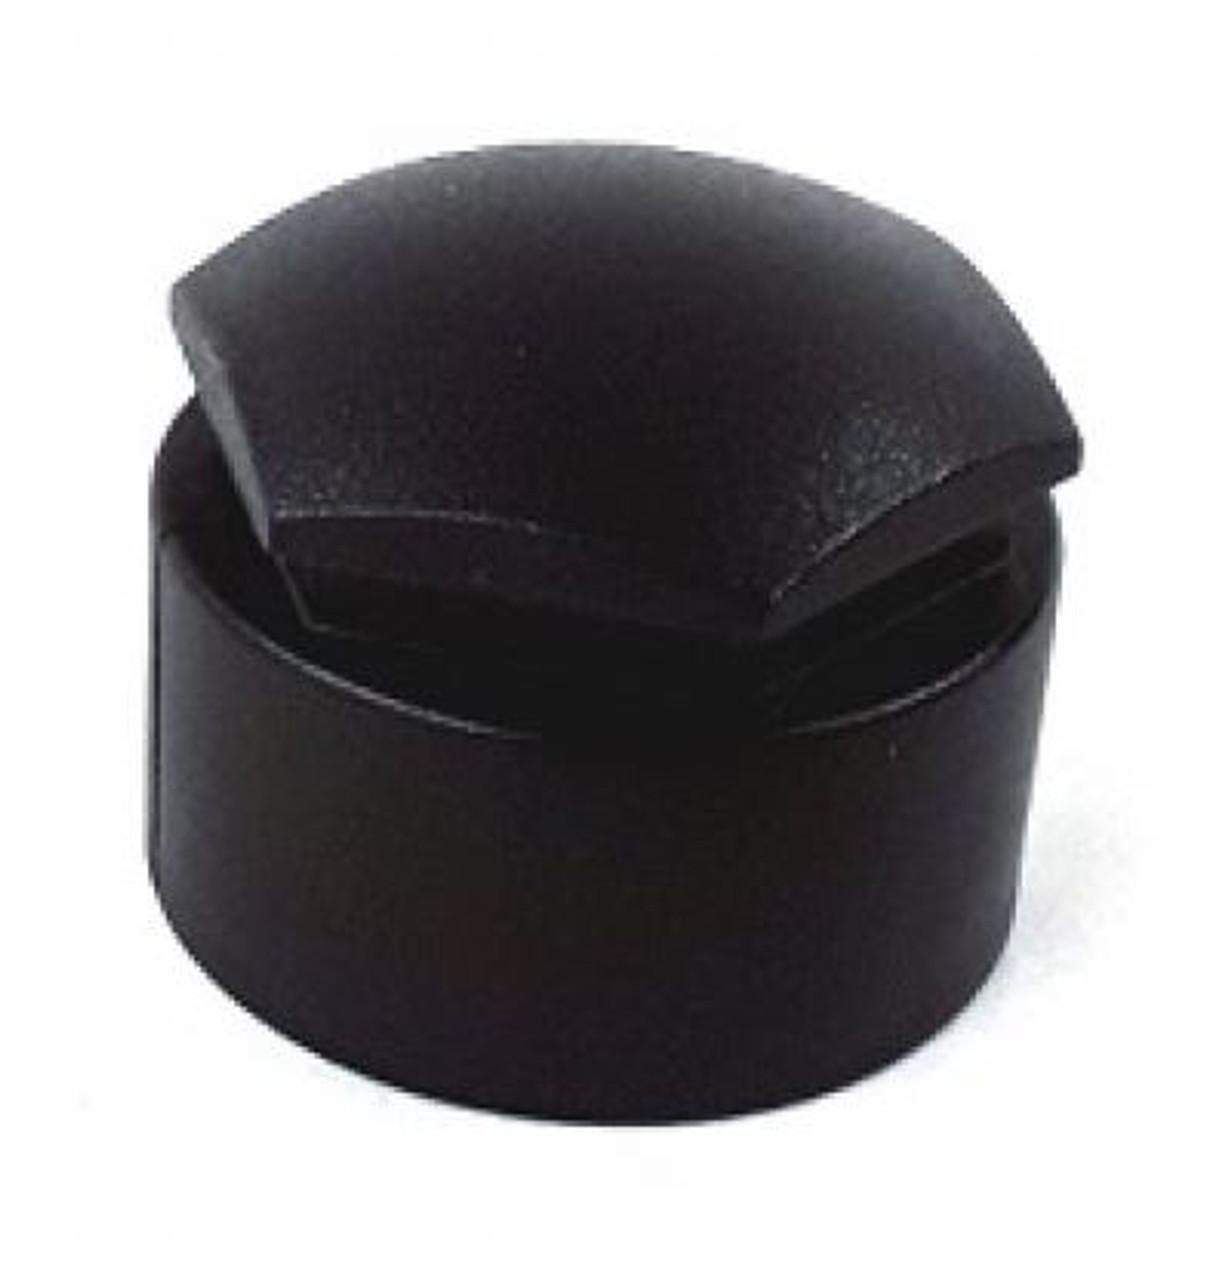 Set of Audi Wheel Bolt Caps 2016+ BLACK